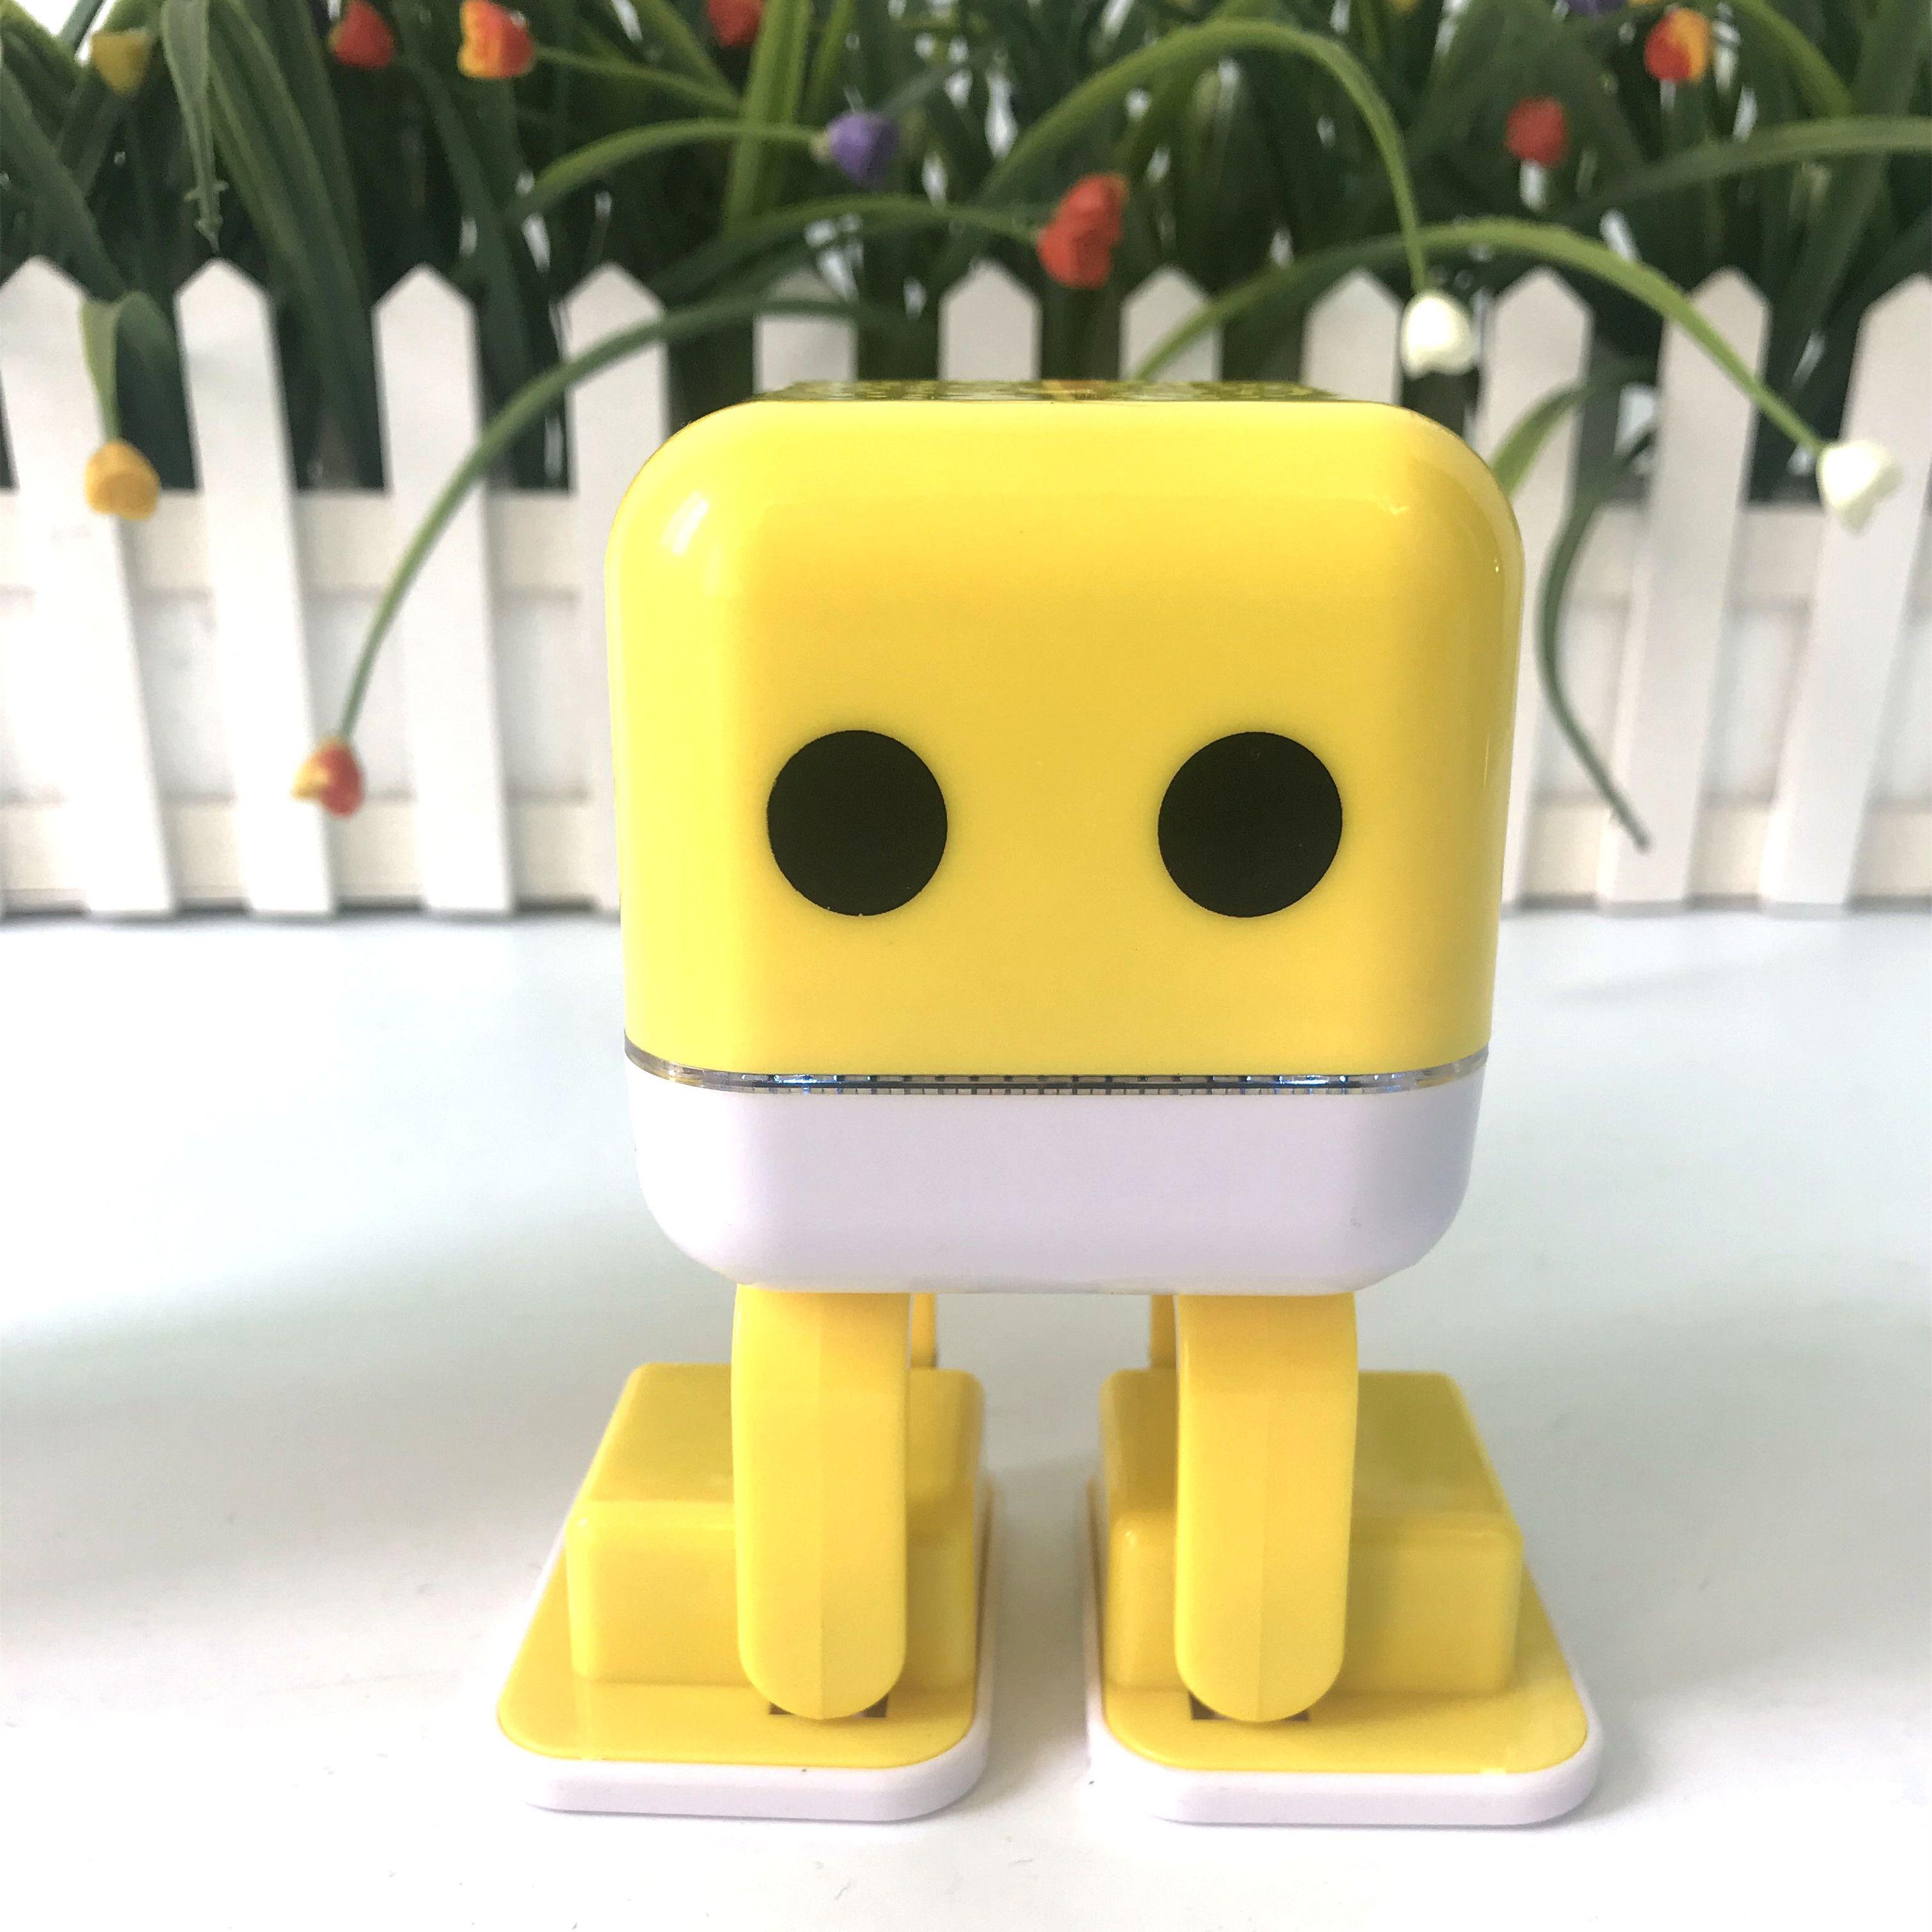 Cubee Robot Toys Kids Gifts Dancing Wireless Speakers Wireless